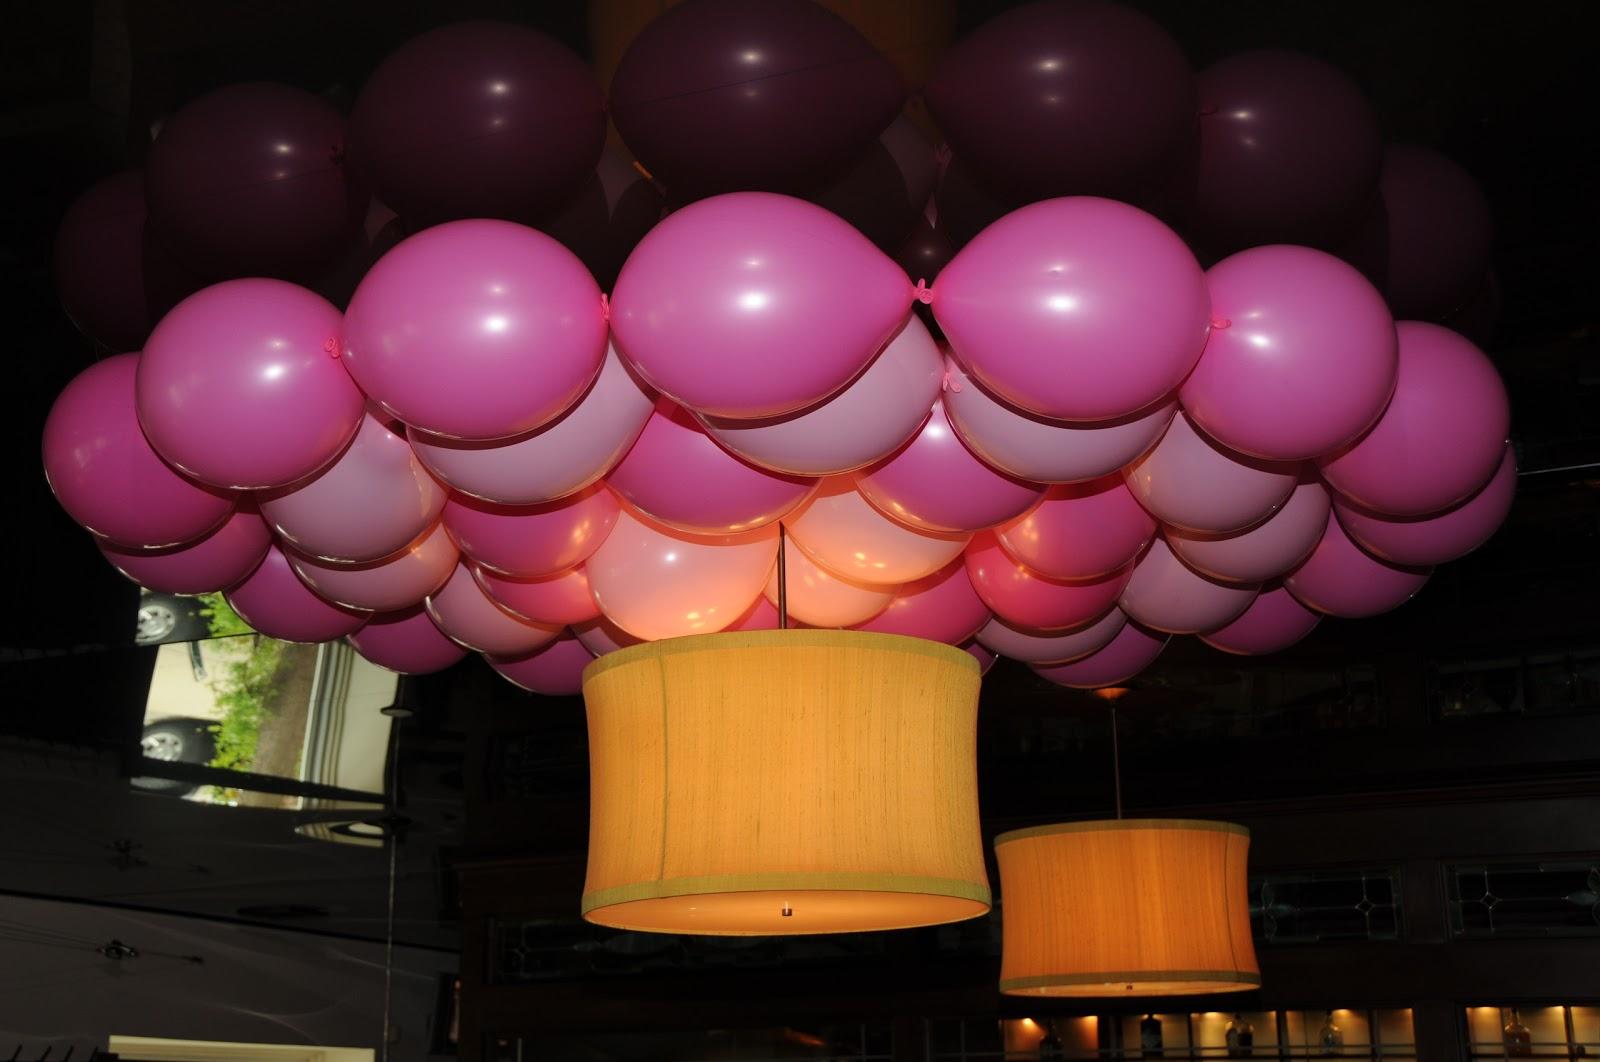 Design Classic Interior 2012: Como Decorar un baby shower con globos